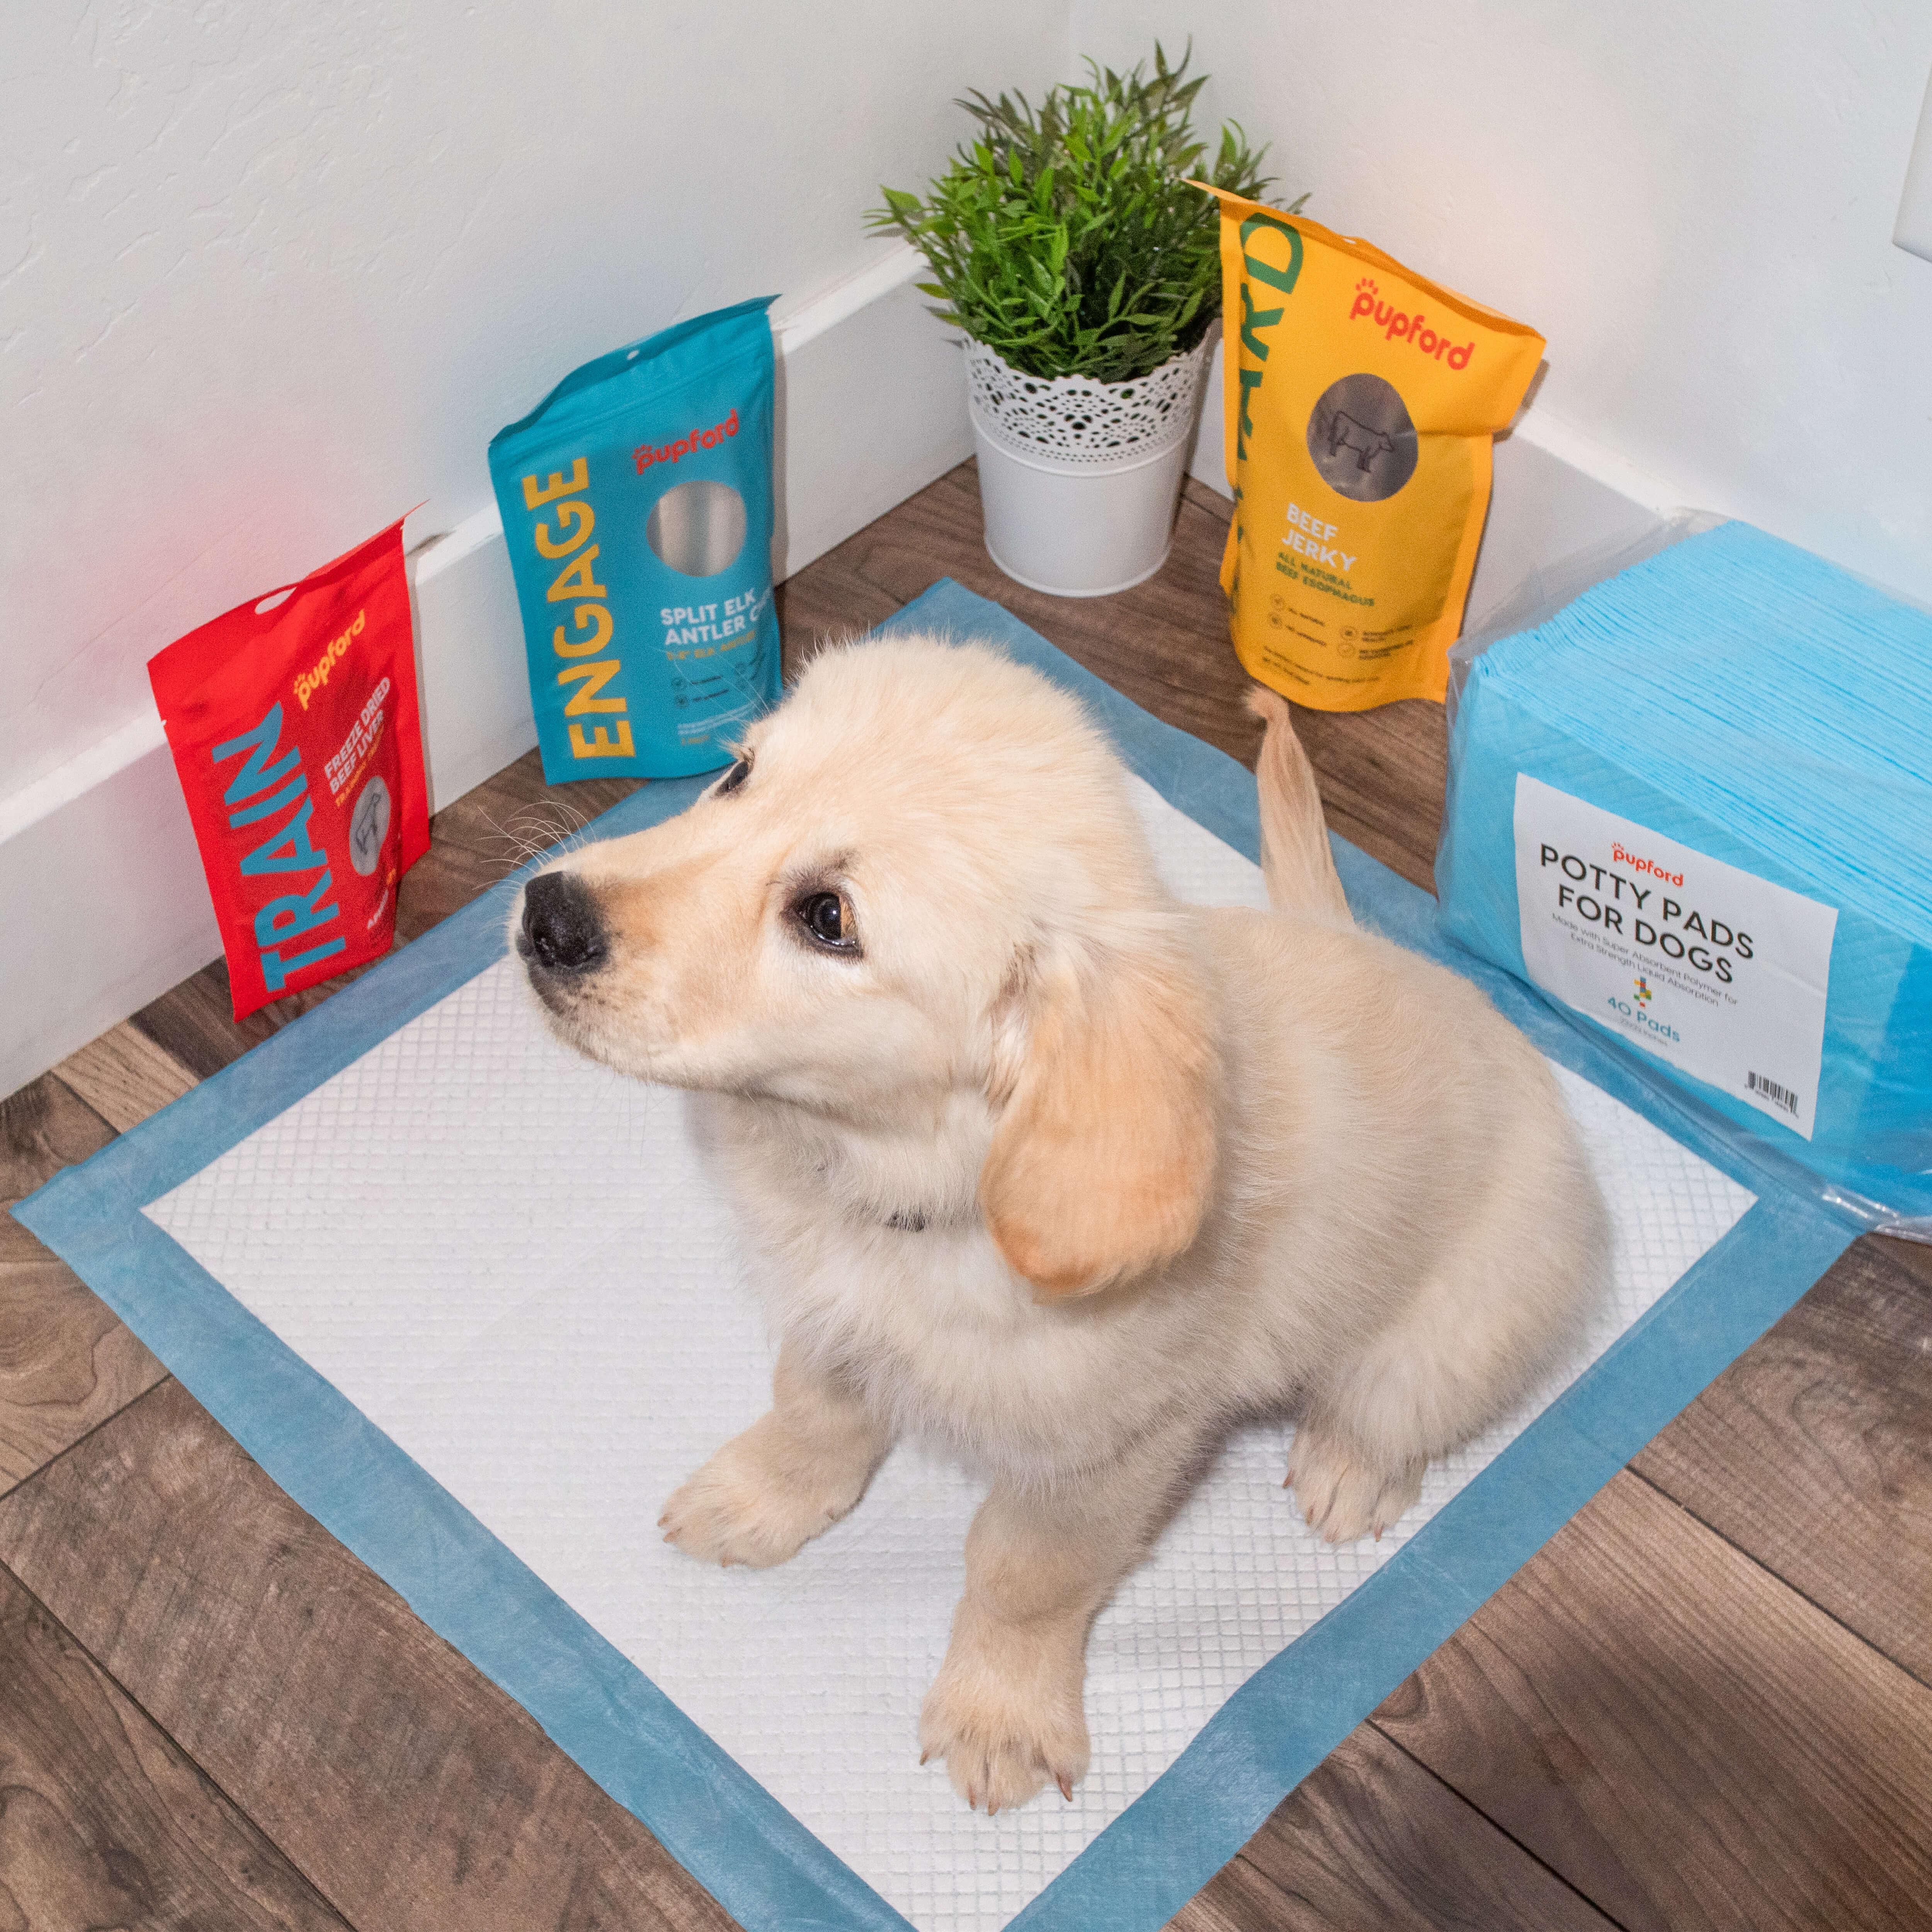 dog on potty pad | Pupford